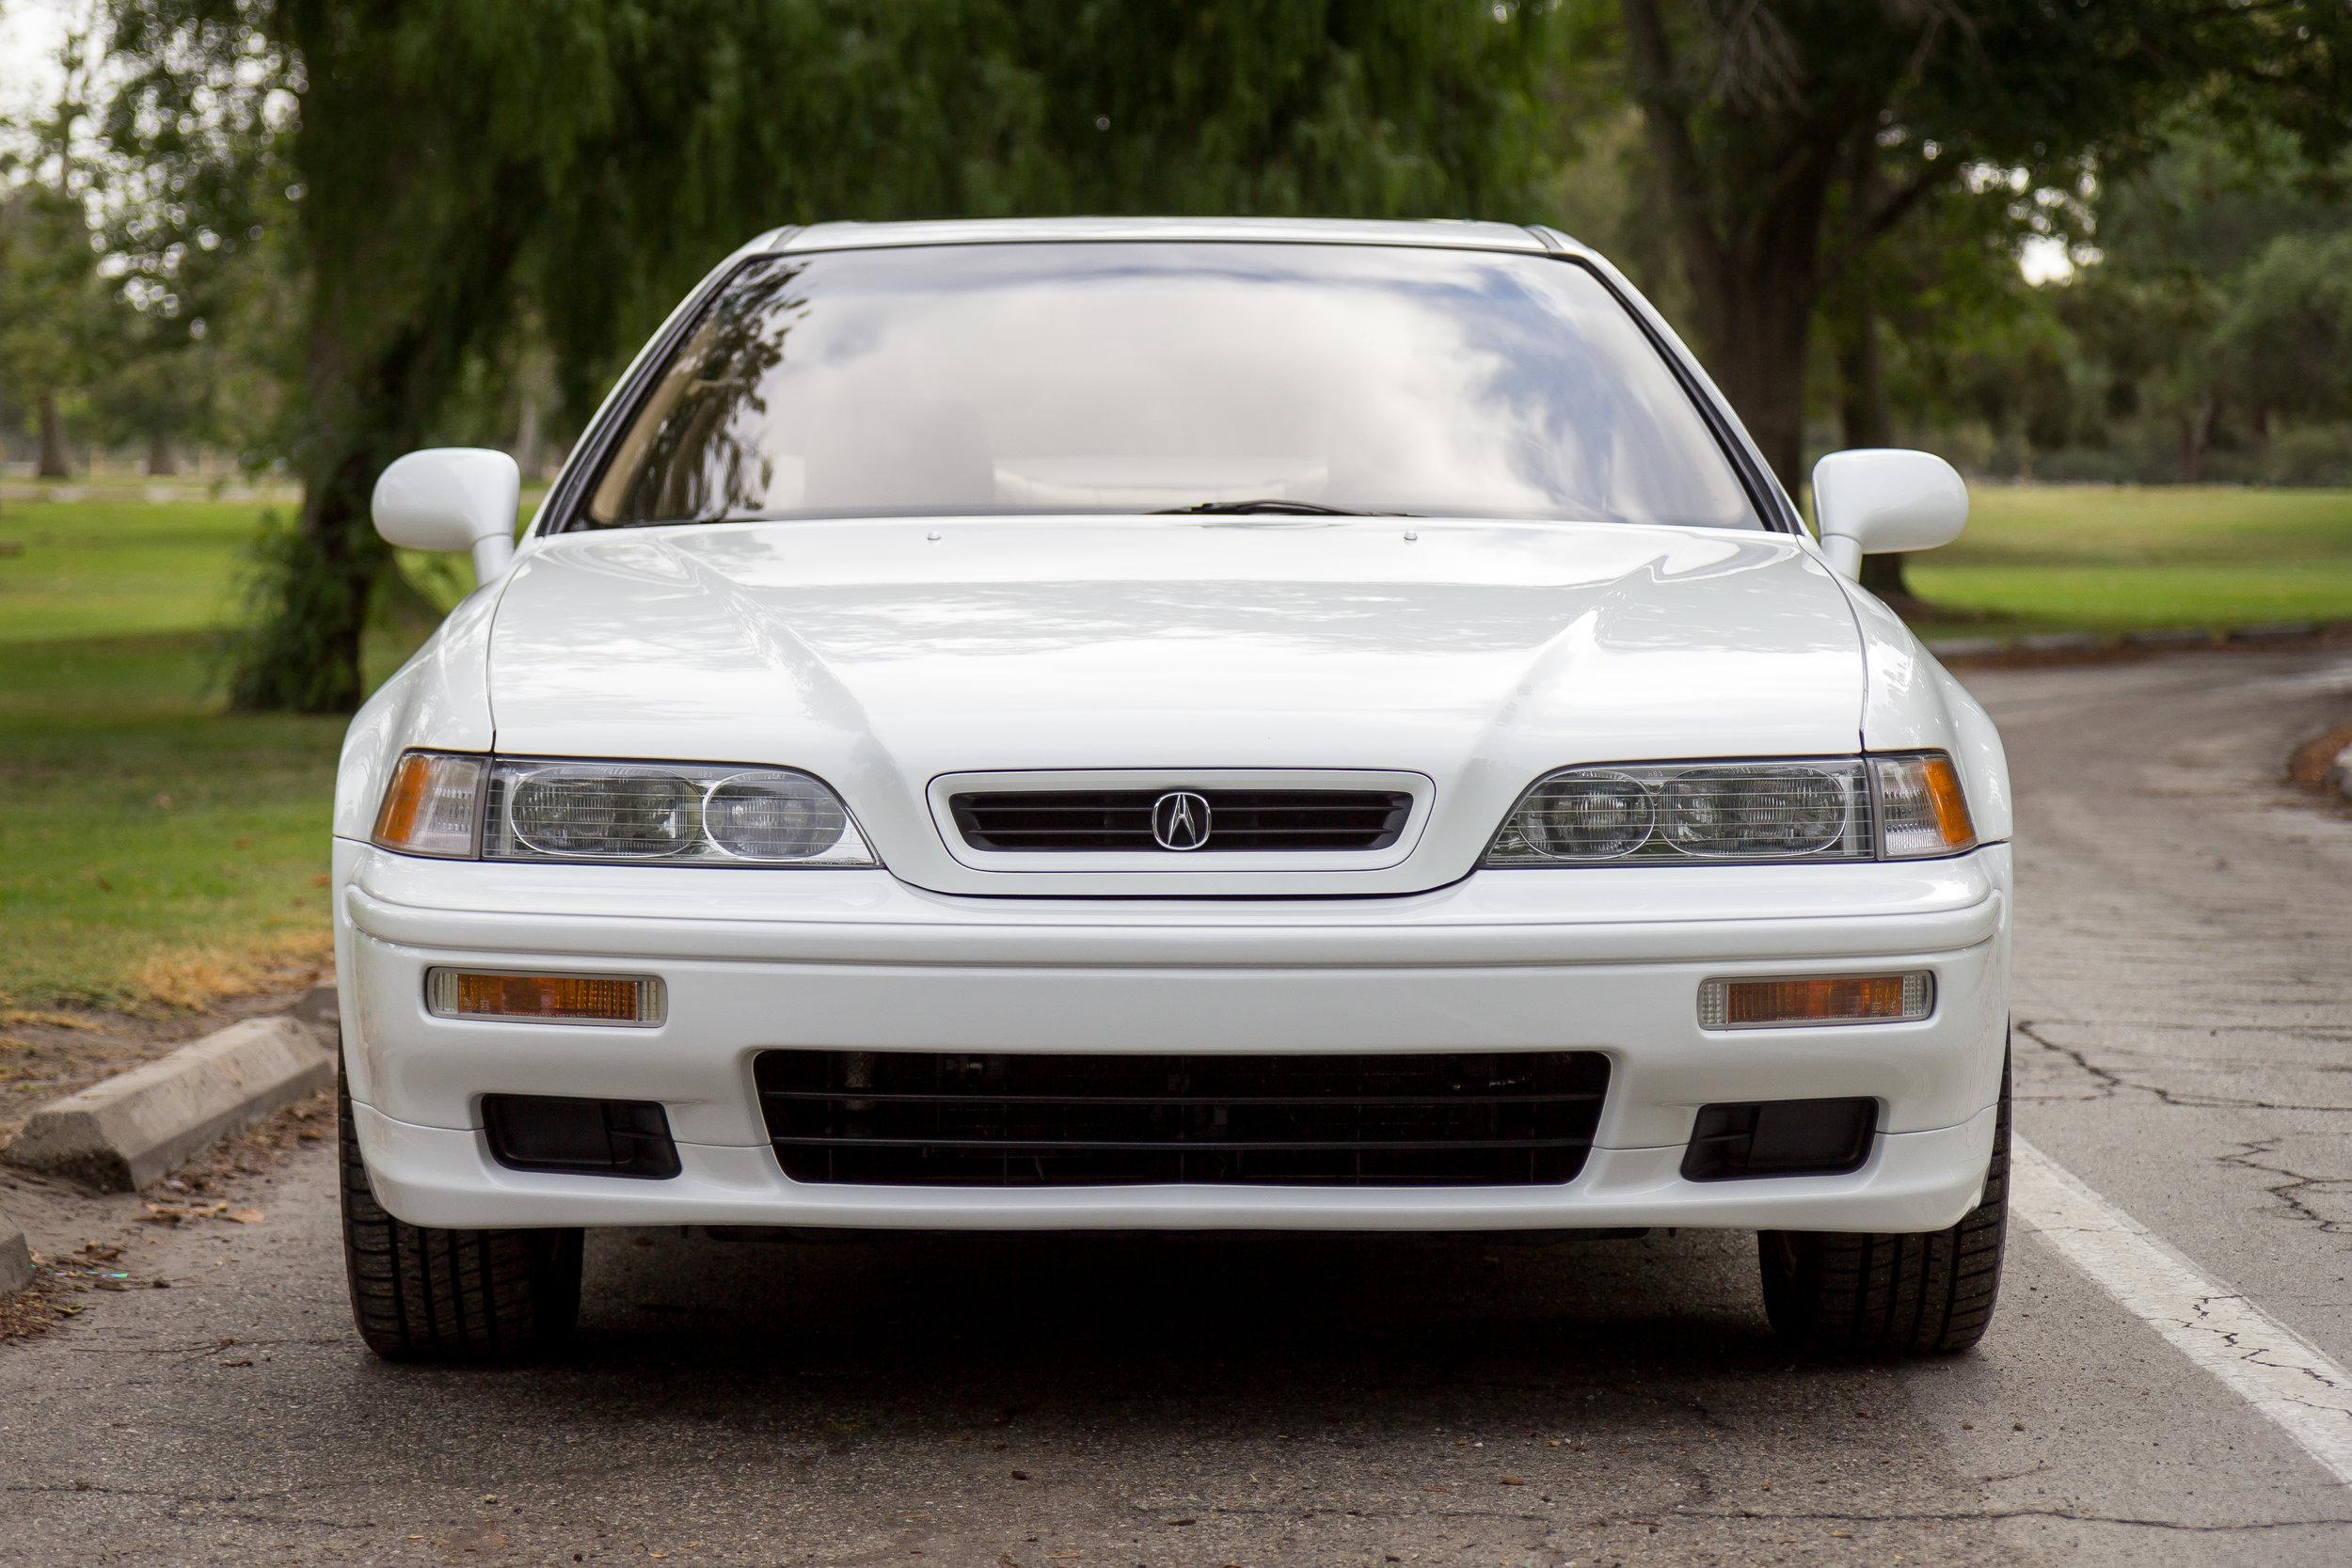 1994 Acura Legend Coupe-22.JPG